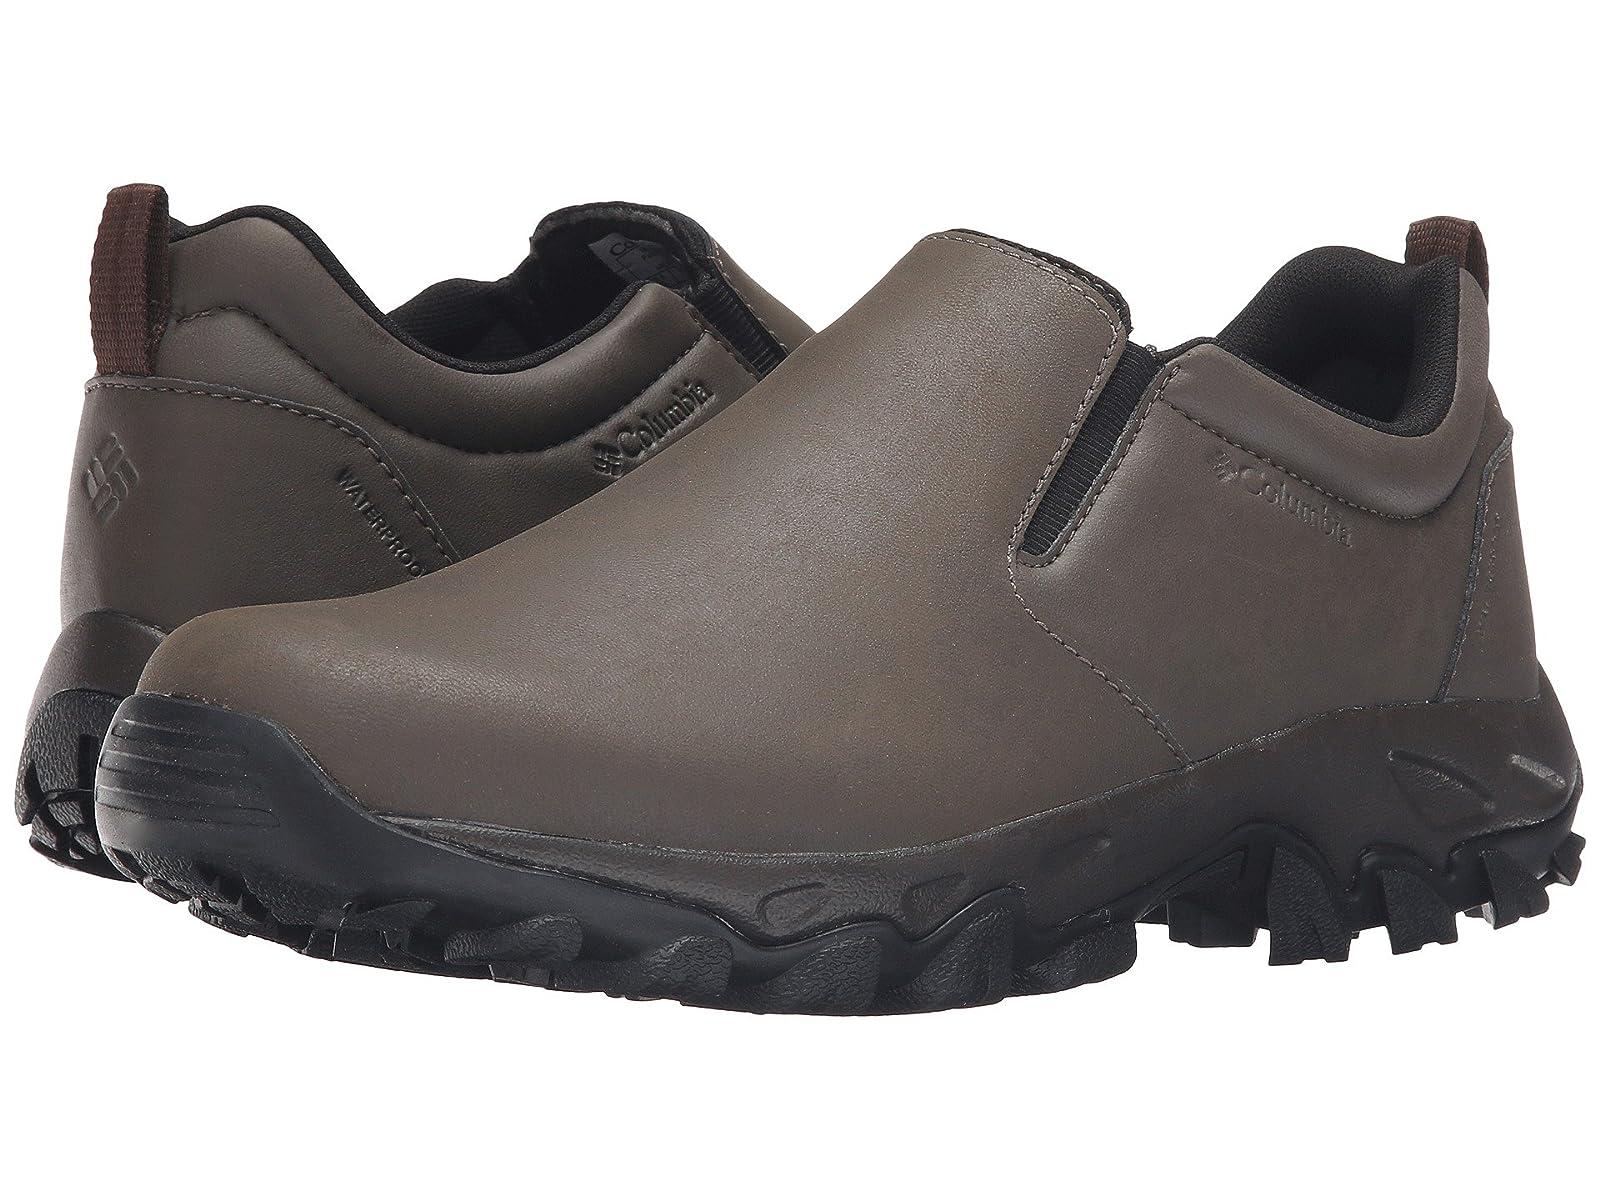 Columbia Newton Ridge Plus Moc WaterproofCheap and distinctive eye-catching shoes